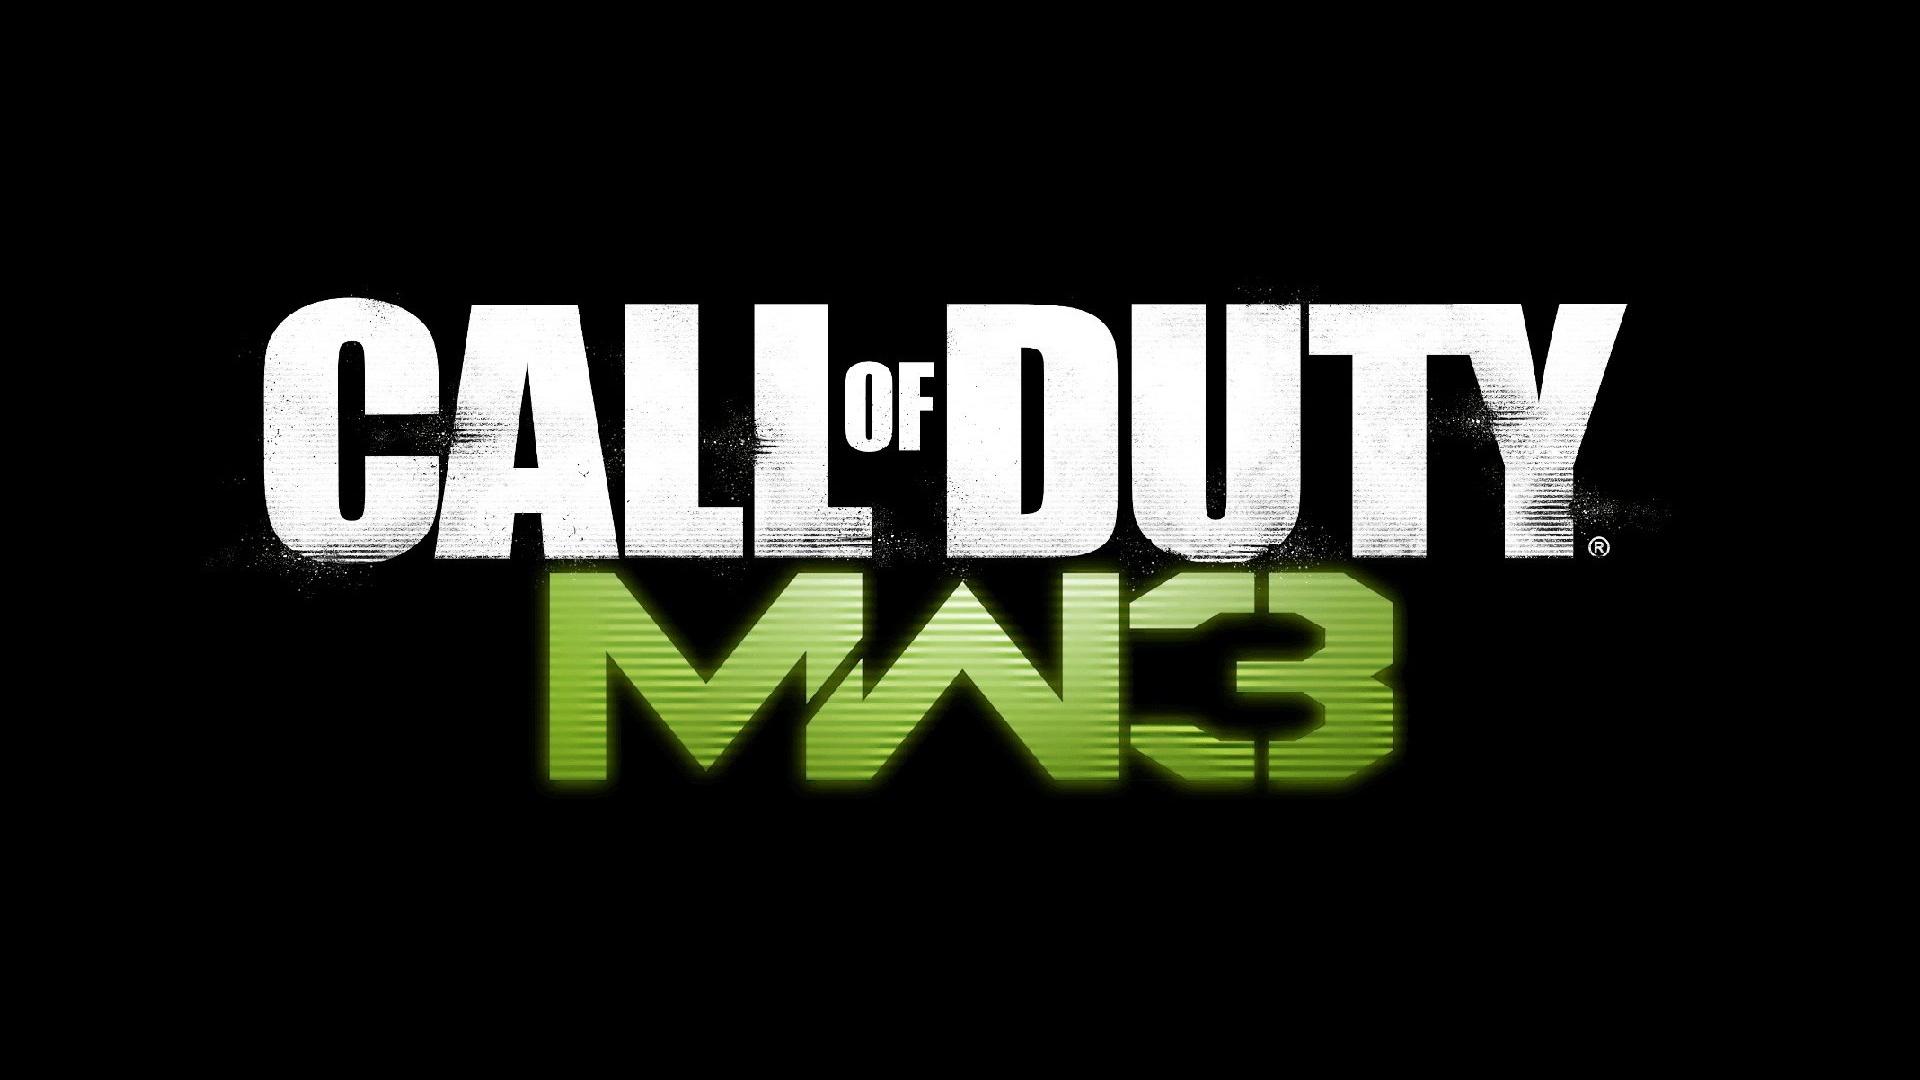 Call of Duty Modern Warfare 3 wallpaper 25